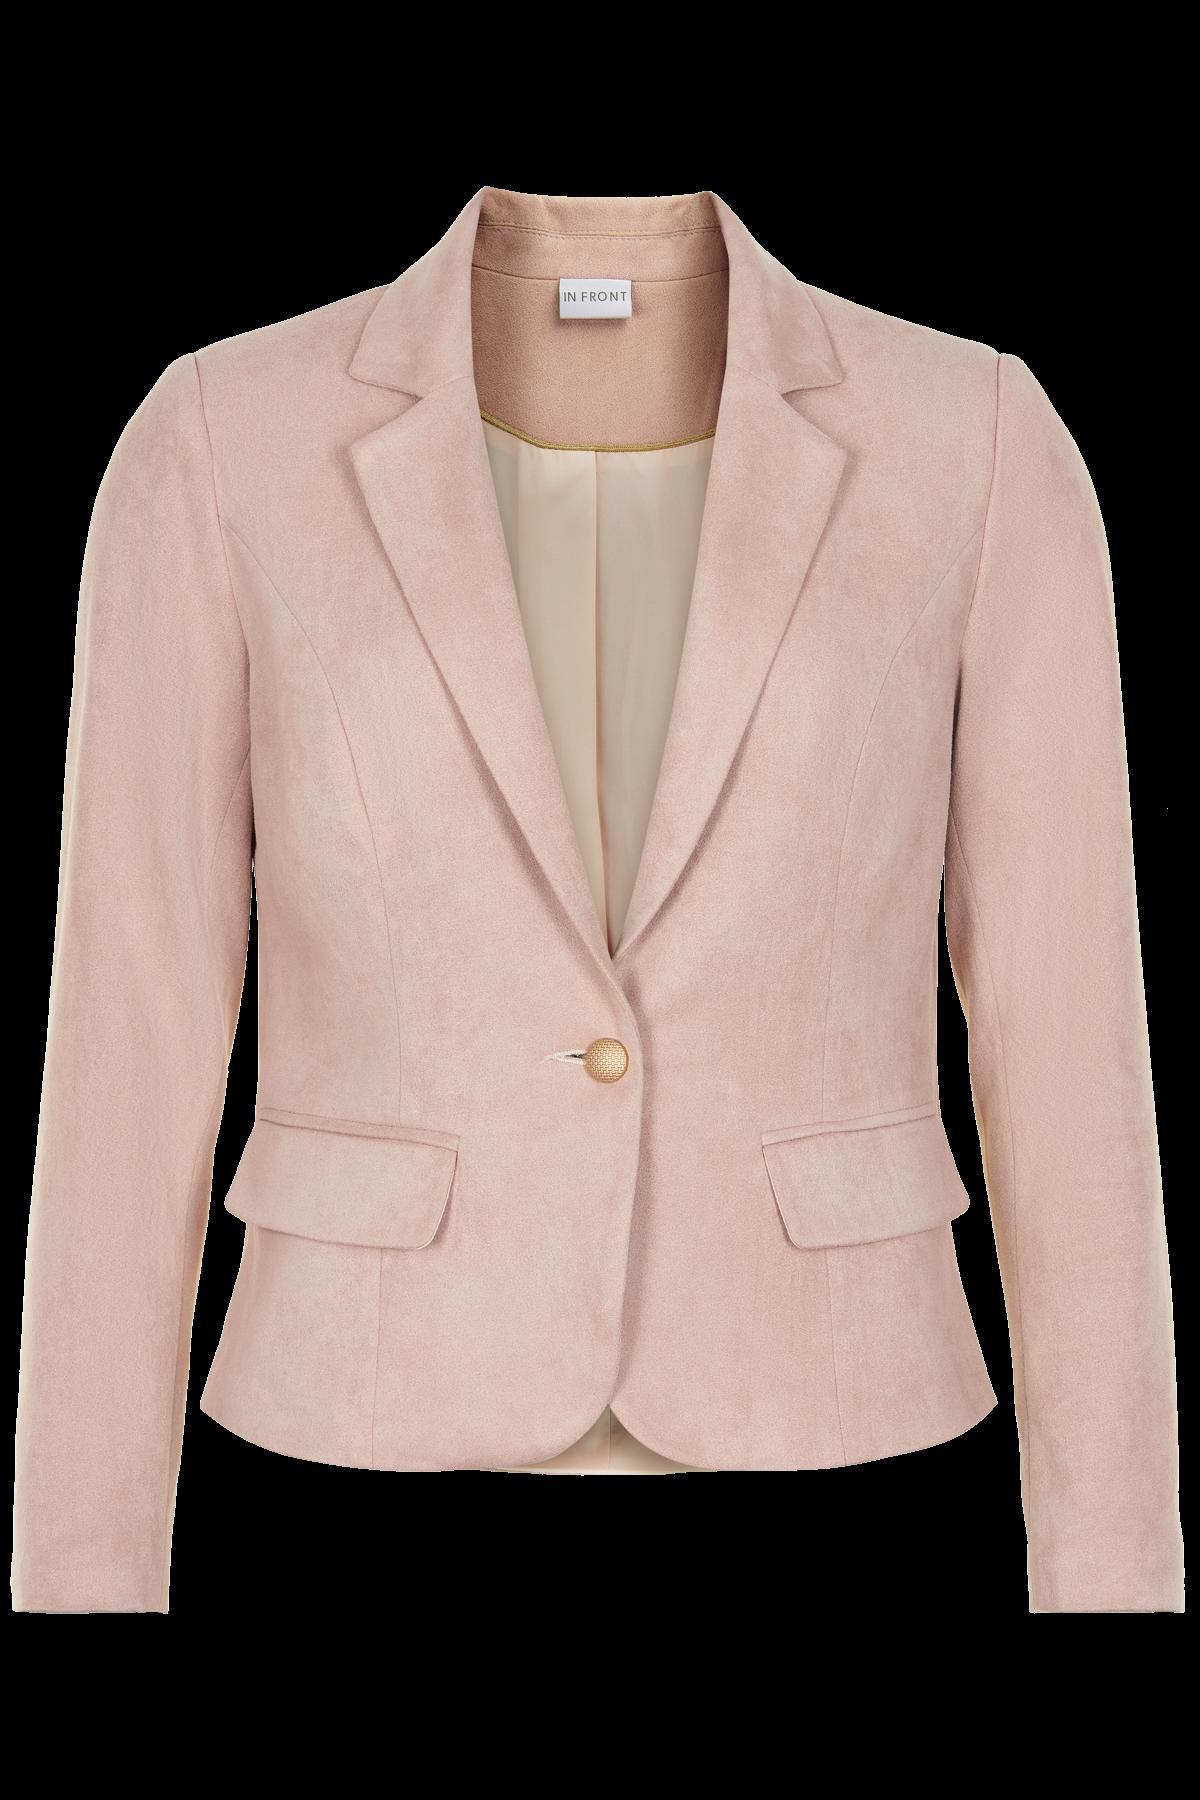 b458902a9 Blazer Dame ( Spar op til 50% ) - Fri fragt | Fashionfifteen.dk